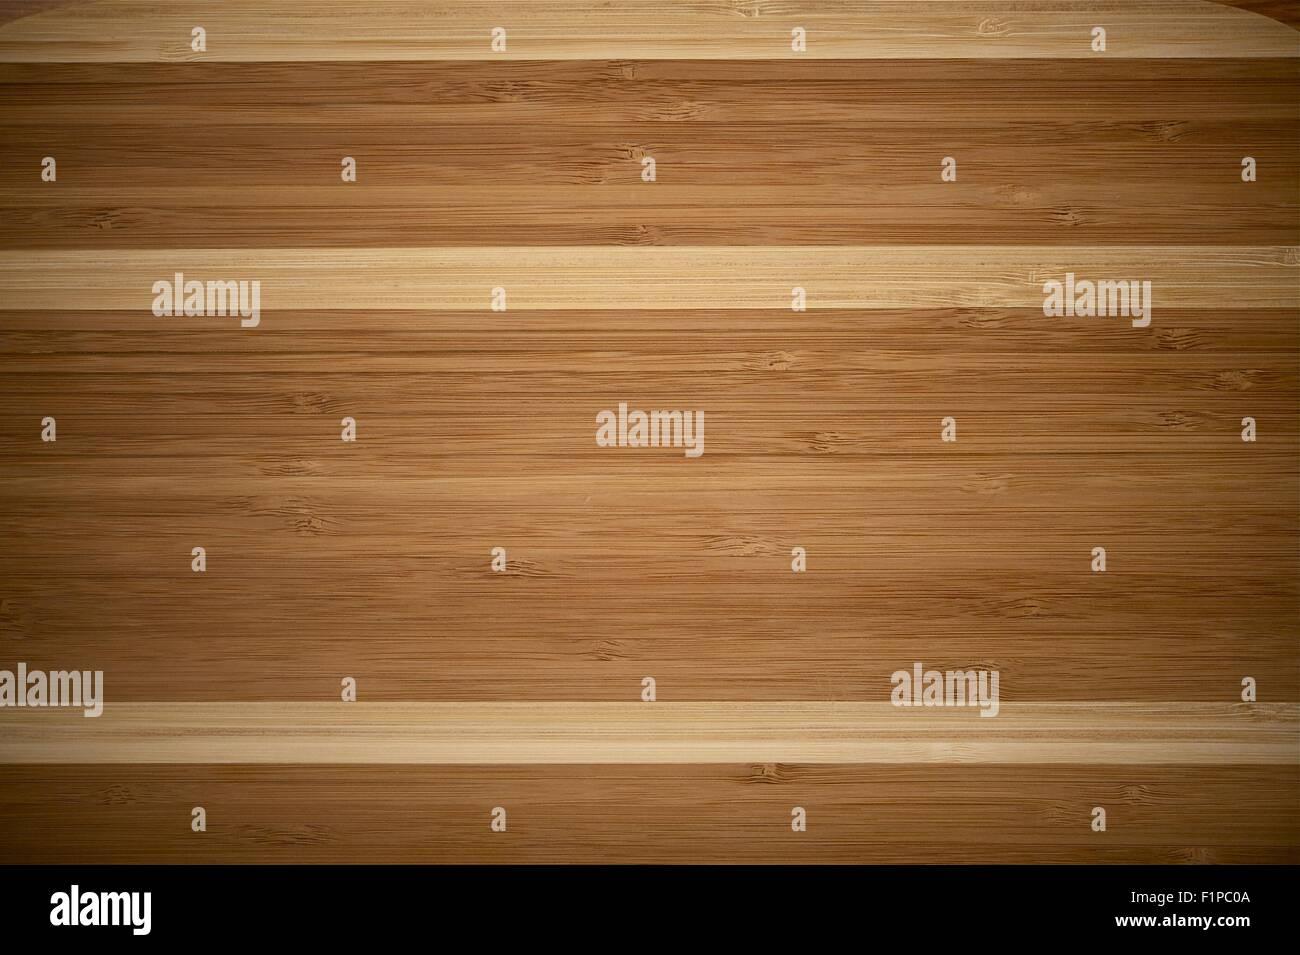 hartholz-fußboden-textur. holz platten boden hintergrund stockfoto